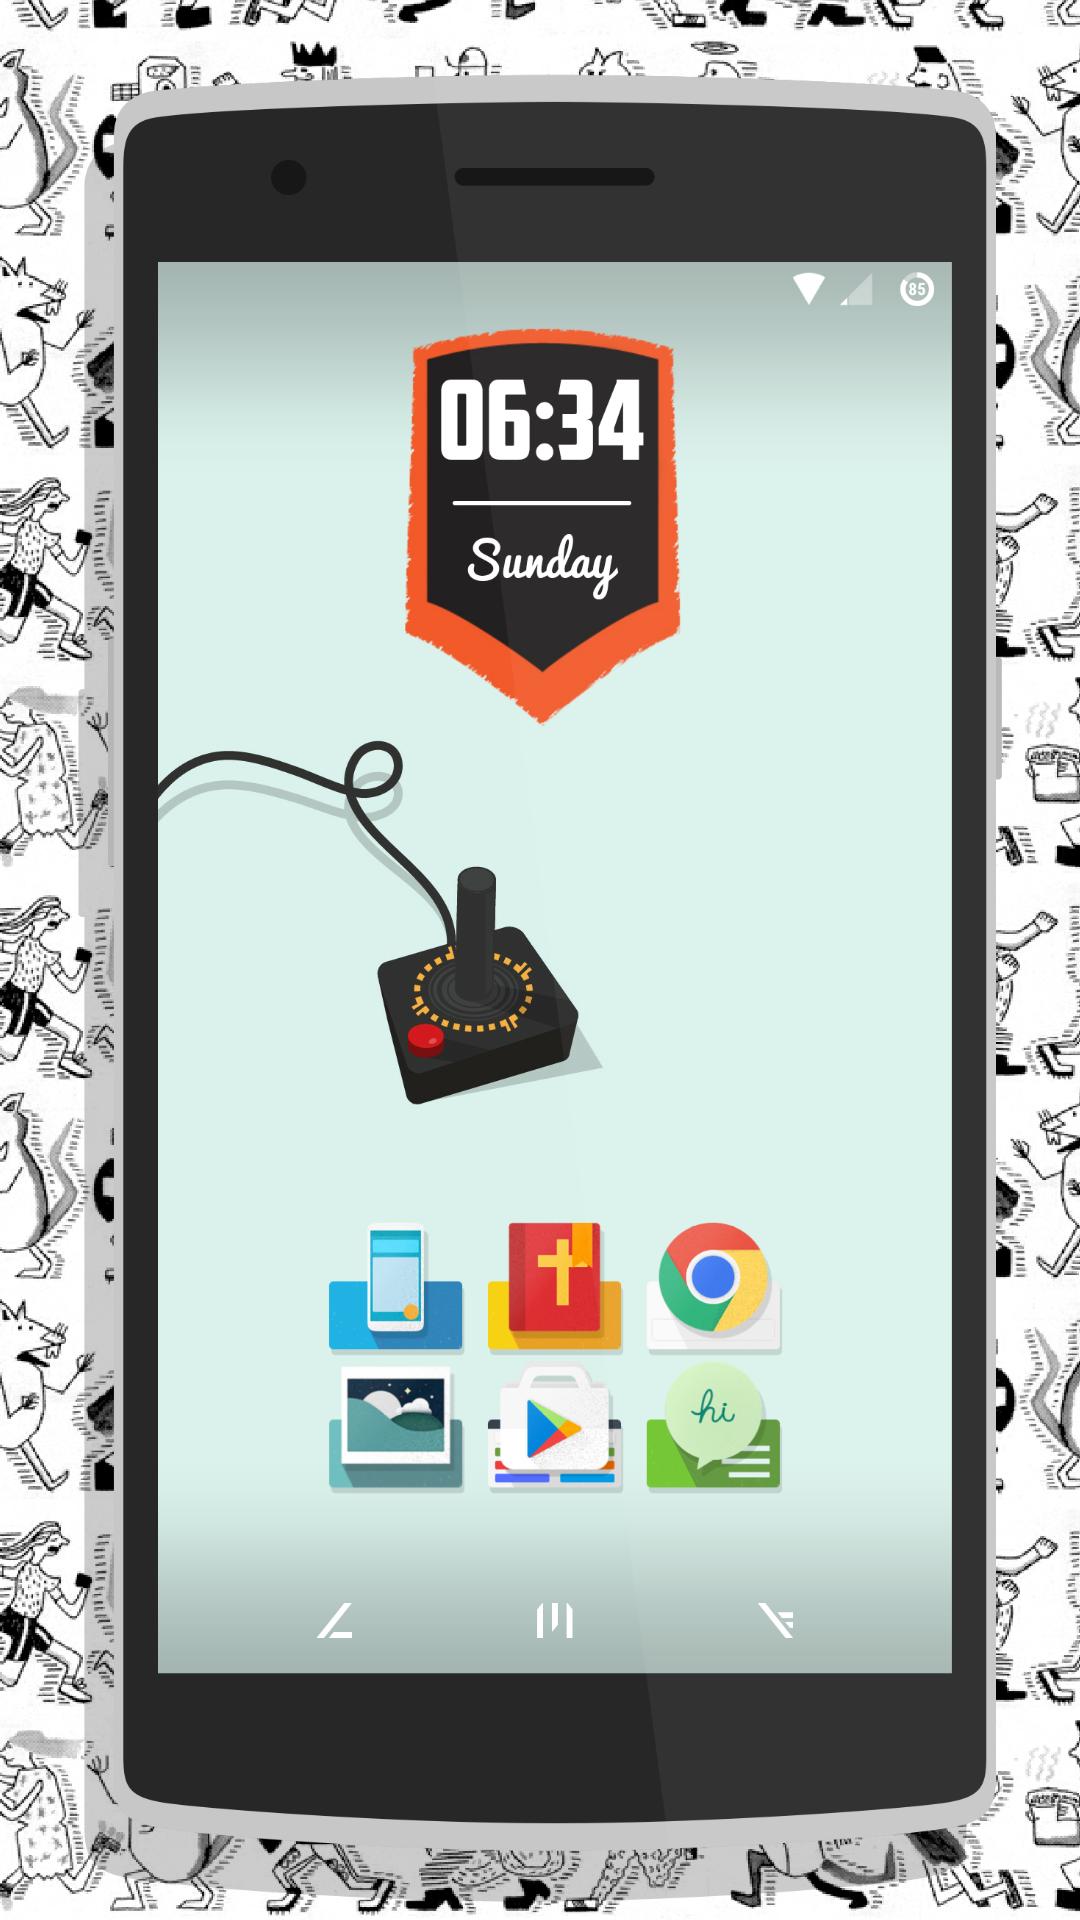 zoopreme zooper widgets androidcustomization wallpaper